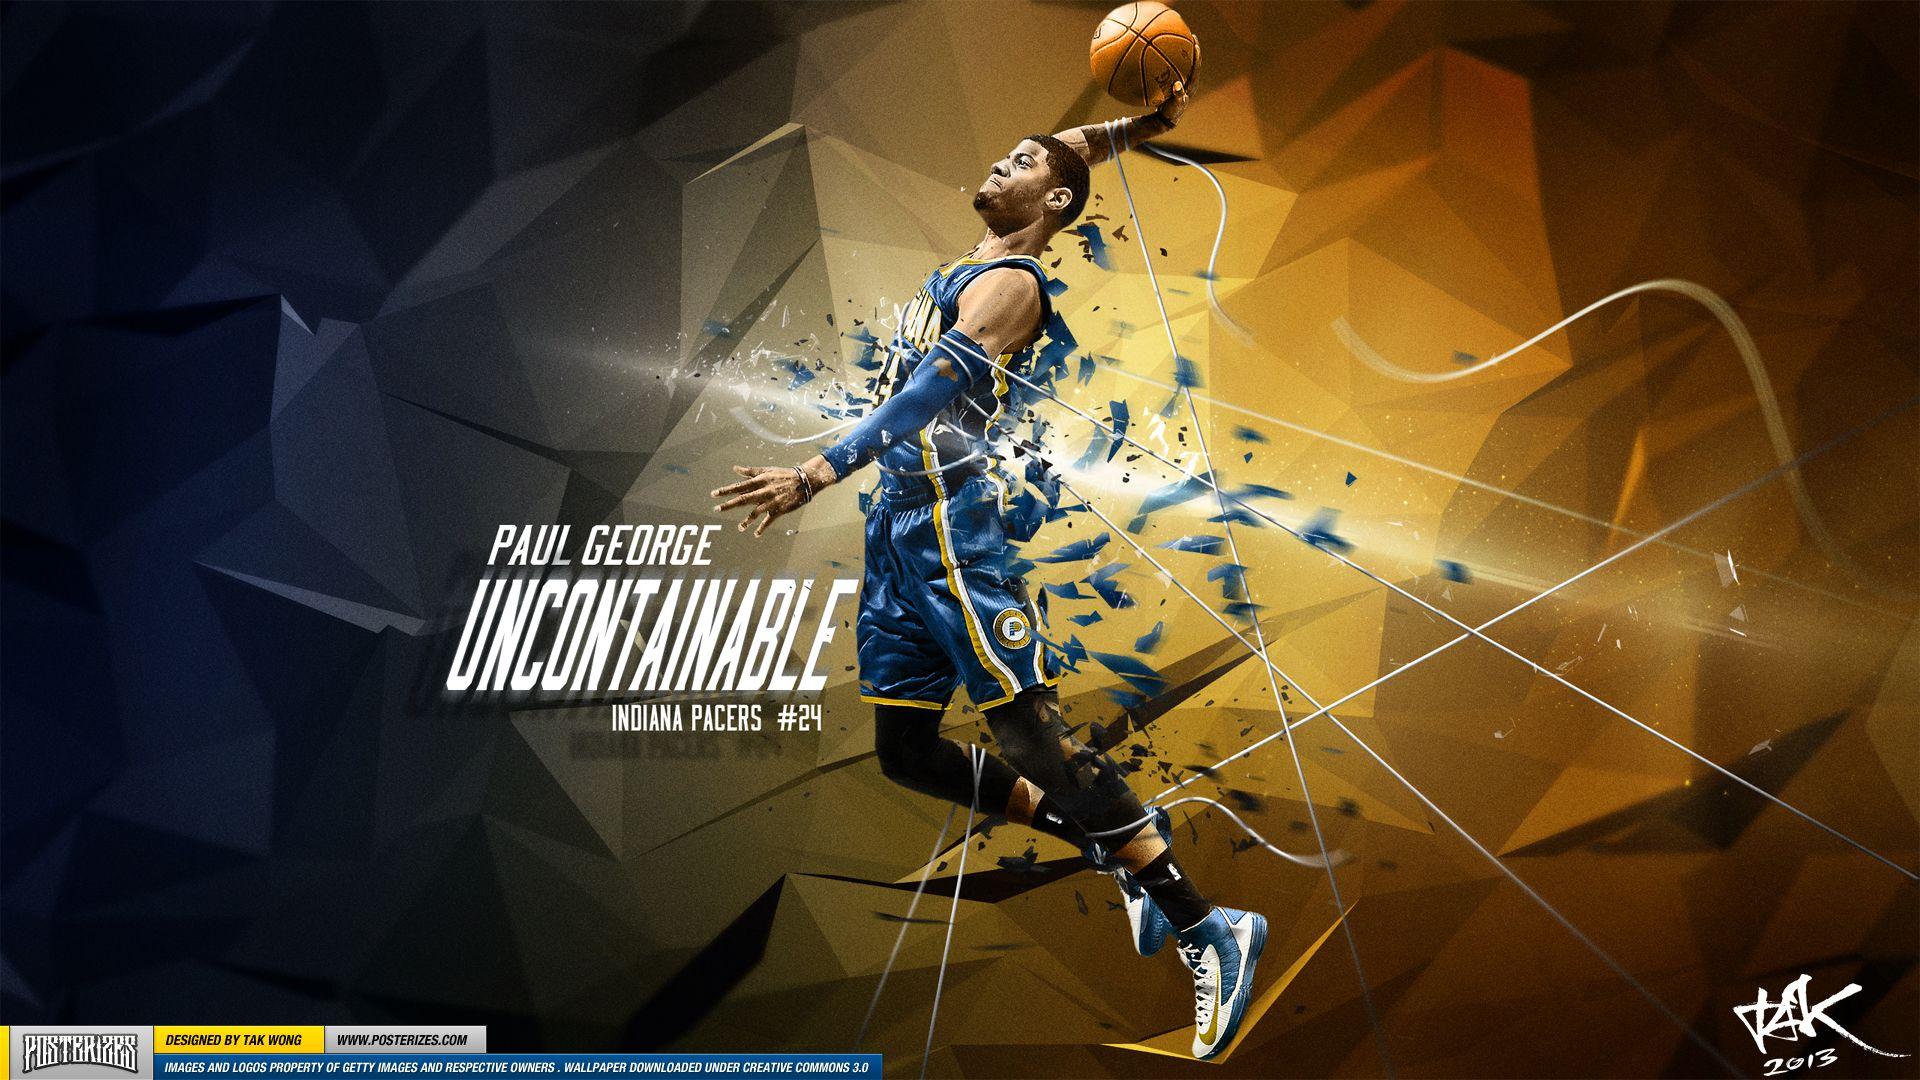 Posterizes Com Nba Wallpaper Artwork: Paul George 'Uncontainable' Wallpaper